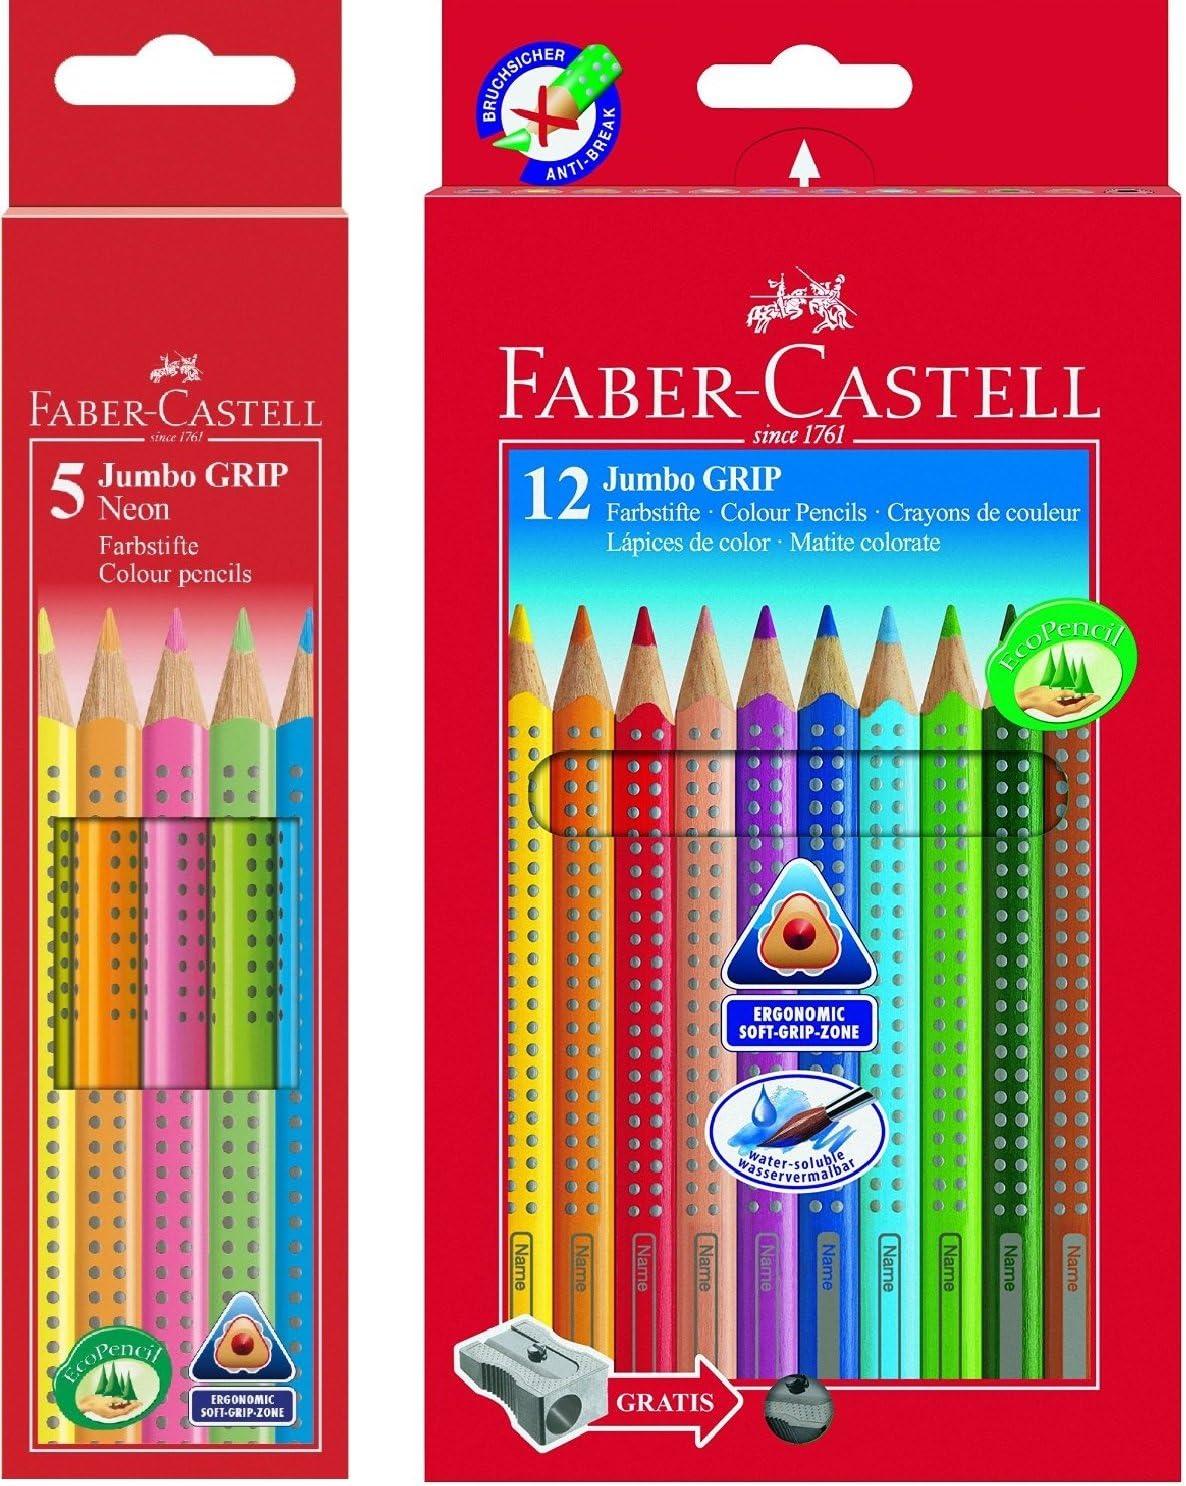 Faber-Castell Bundle 110912 lápices de jumbo grip 12 estuche de cartón; incluye sacapuntas y FABER-CASTELL 110994 – Estuche de lápices de colores JUMBO GRIP Neon, 5, color Bundle neon + 12er bunt: